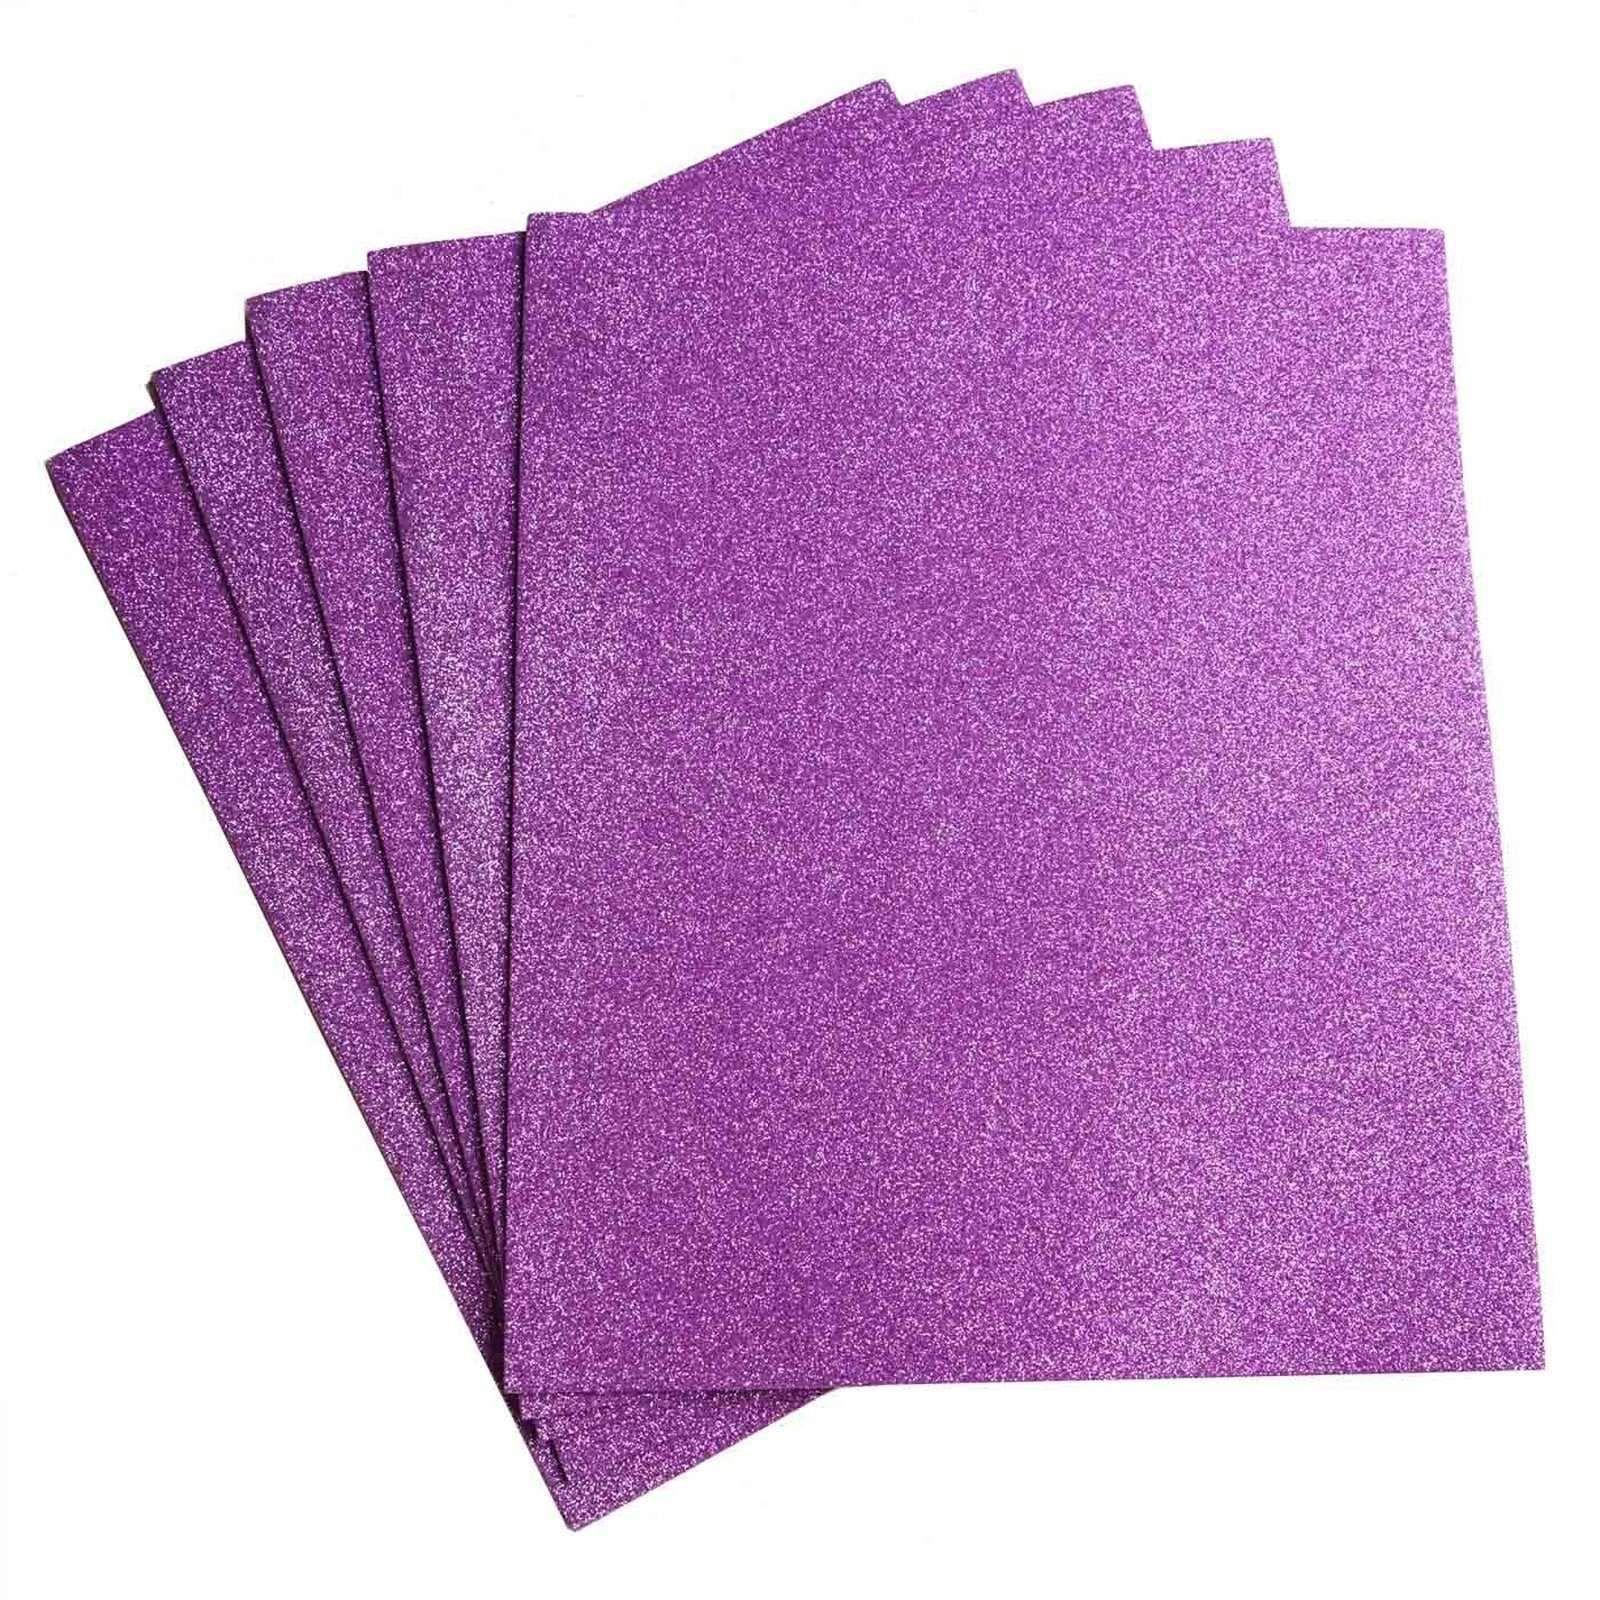 "10 Pack 12"" Lavender UltraGlitter Foam Single Color DIY"